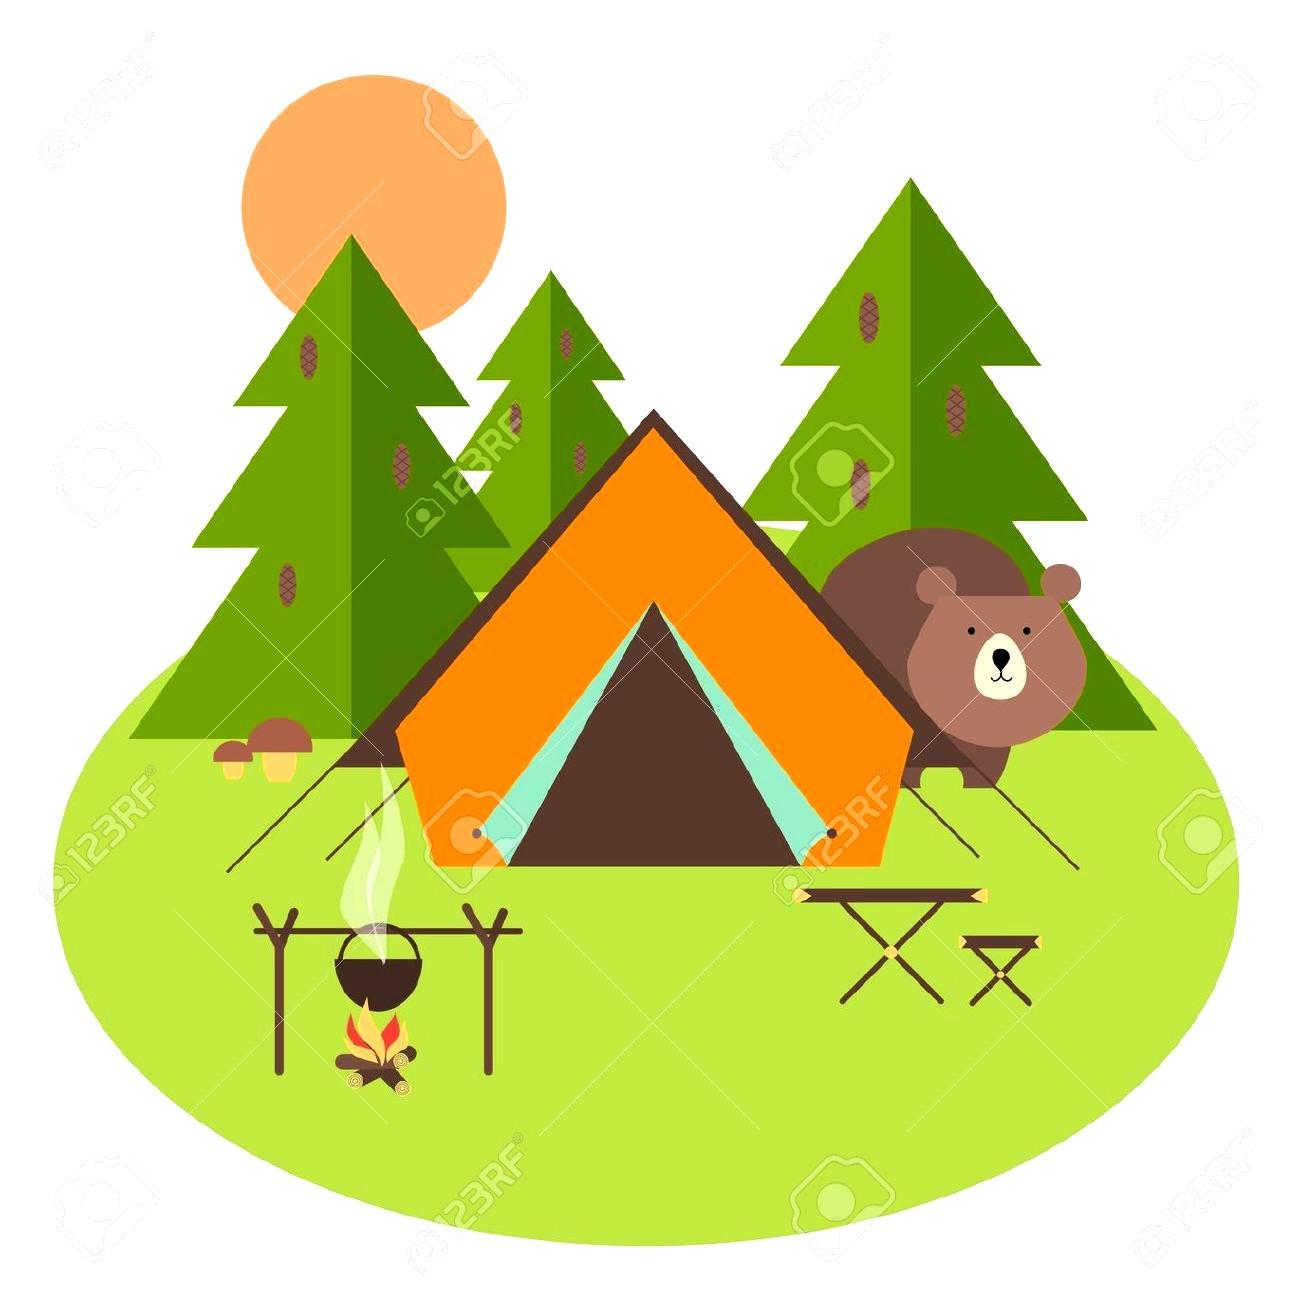 Camping Clipart at GetDrawings.com.